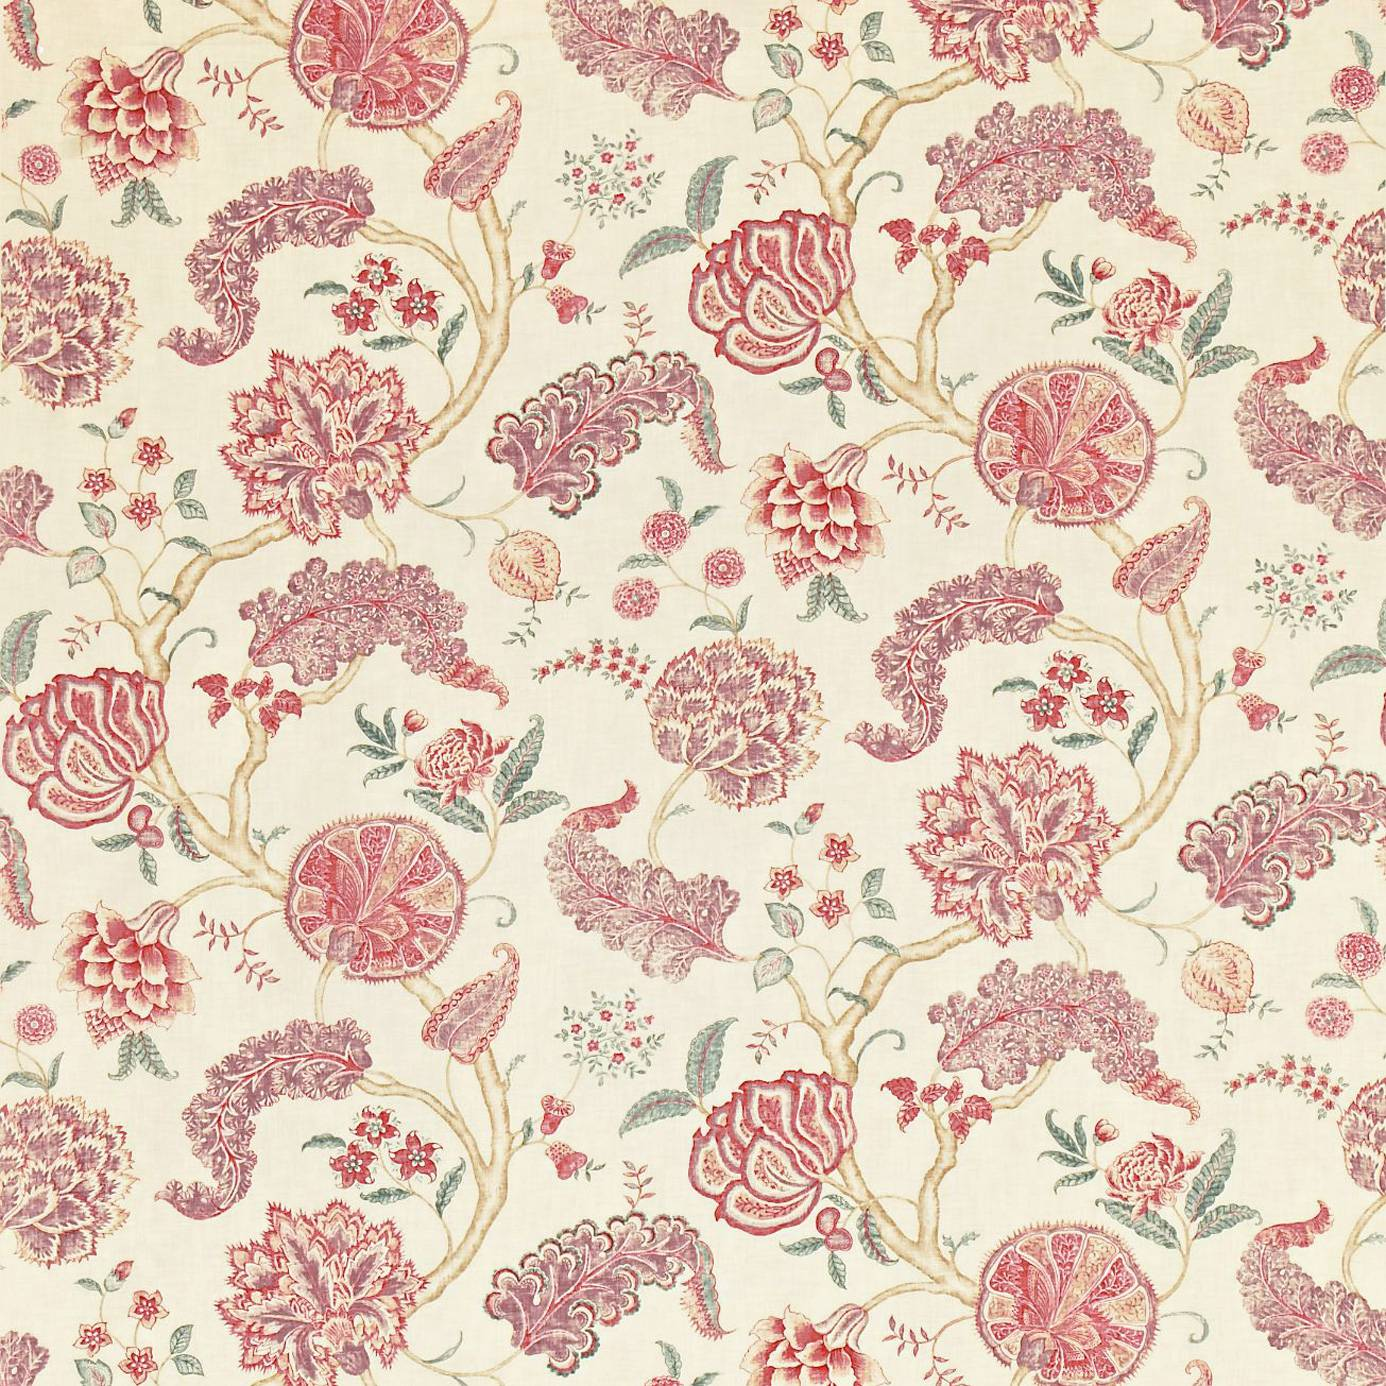 palampore fabric mauve rose dcavpa202 sanderson. Black Bedroom Furniture Sets. Home Design Ideas